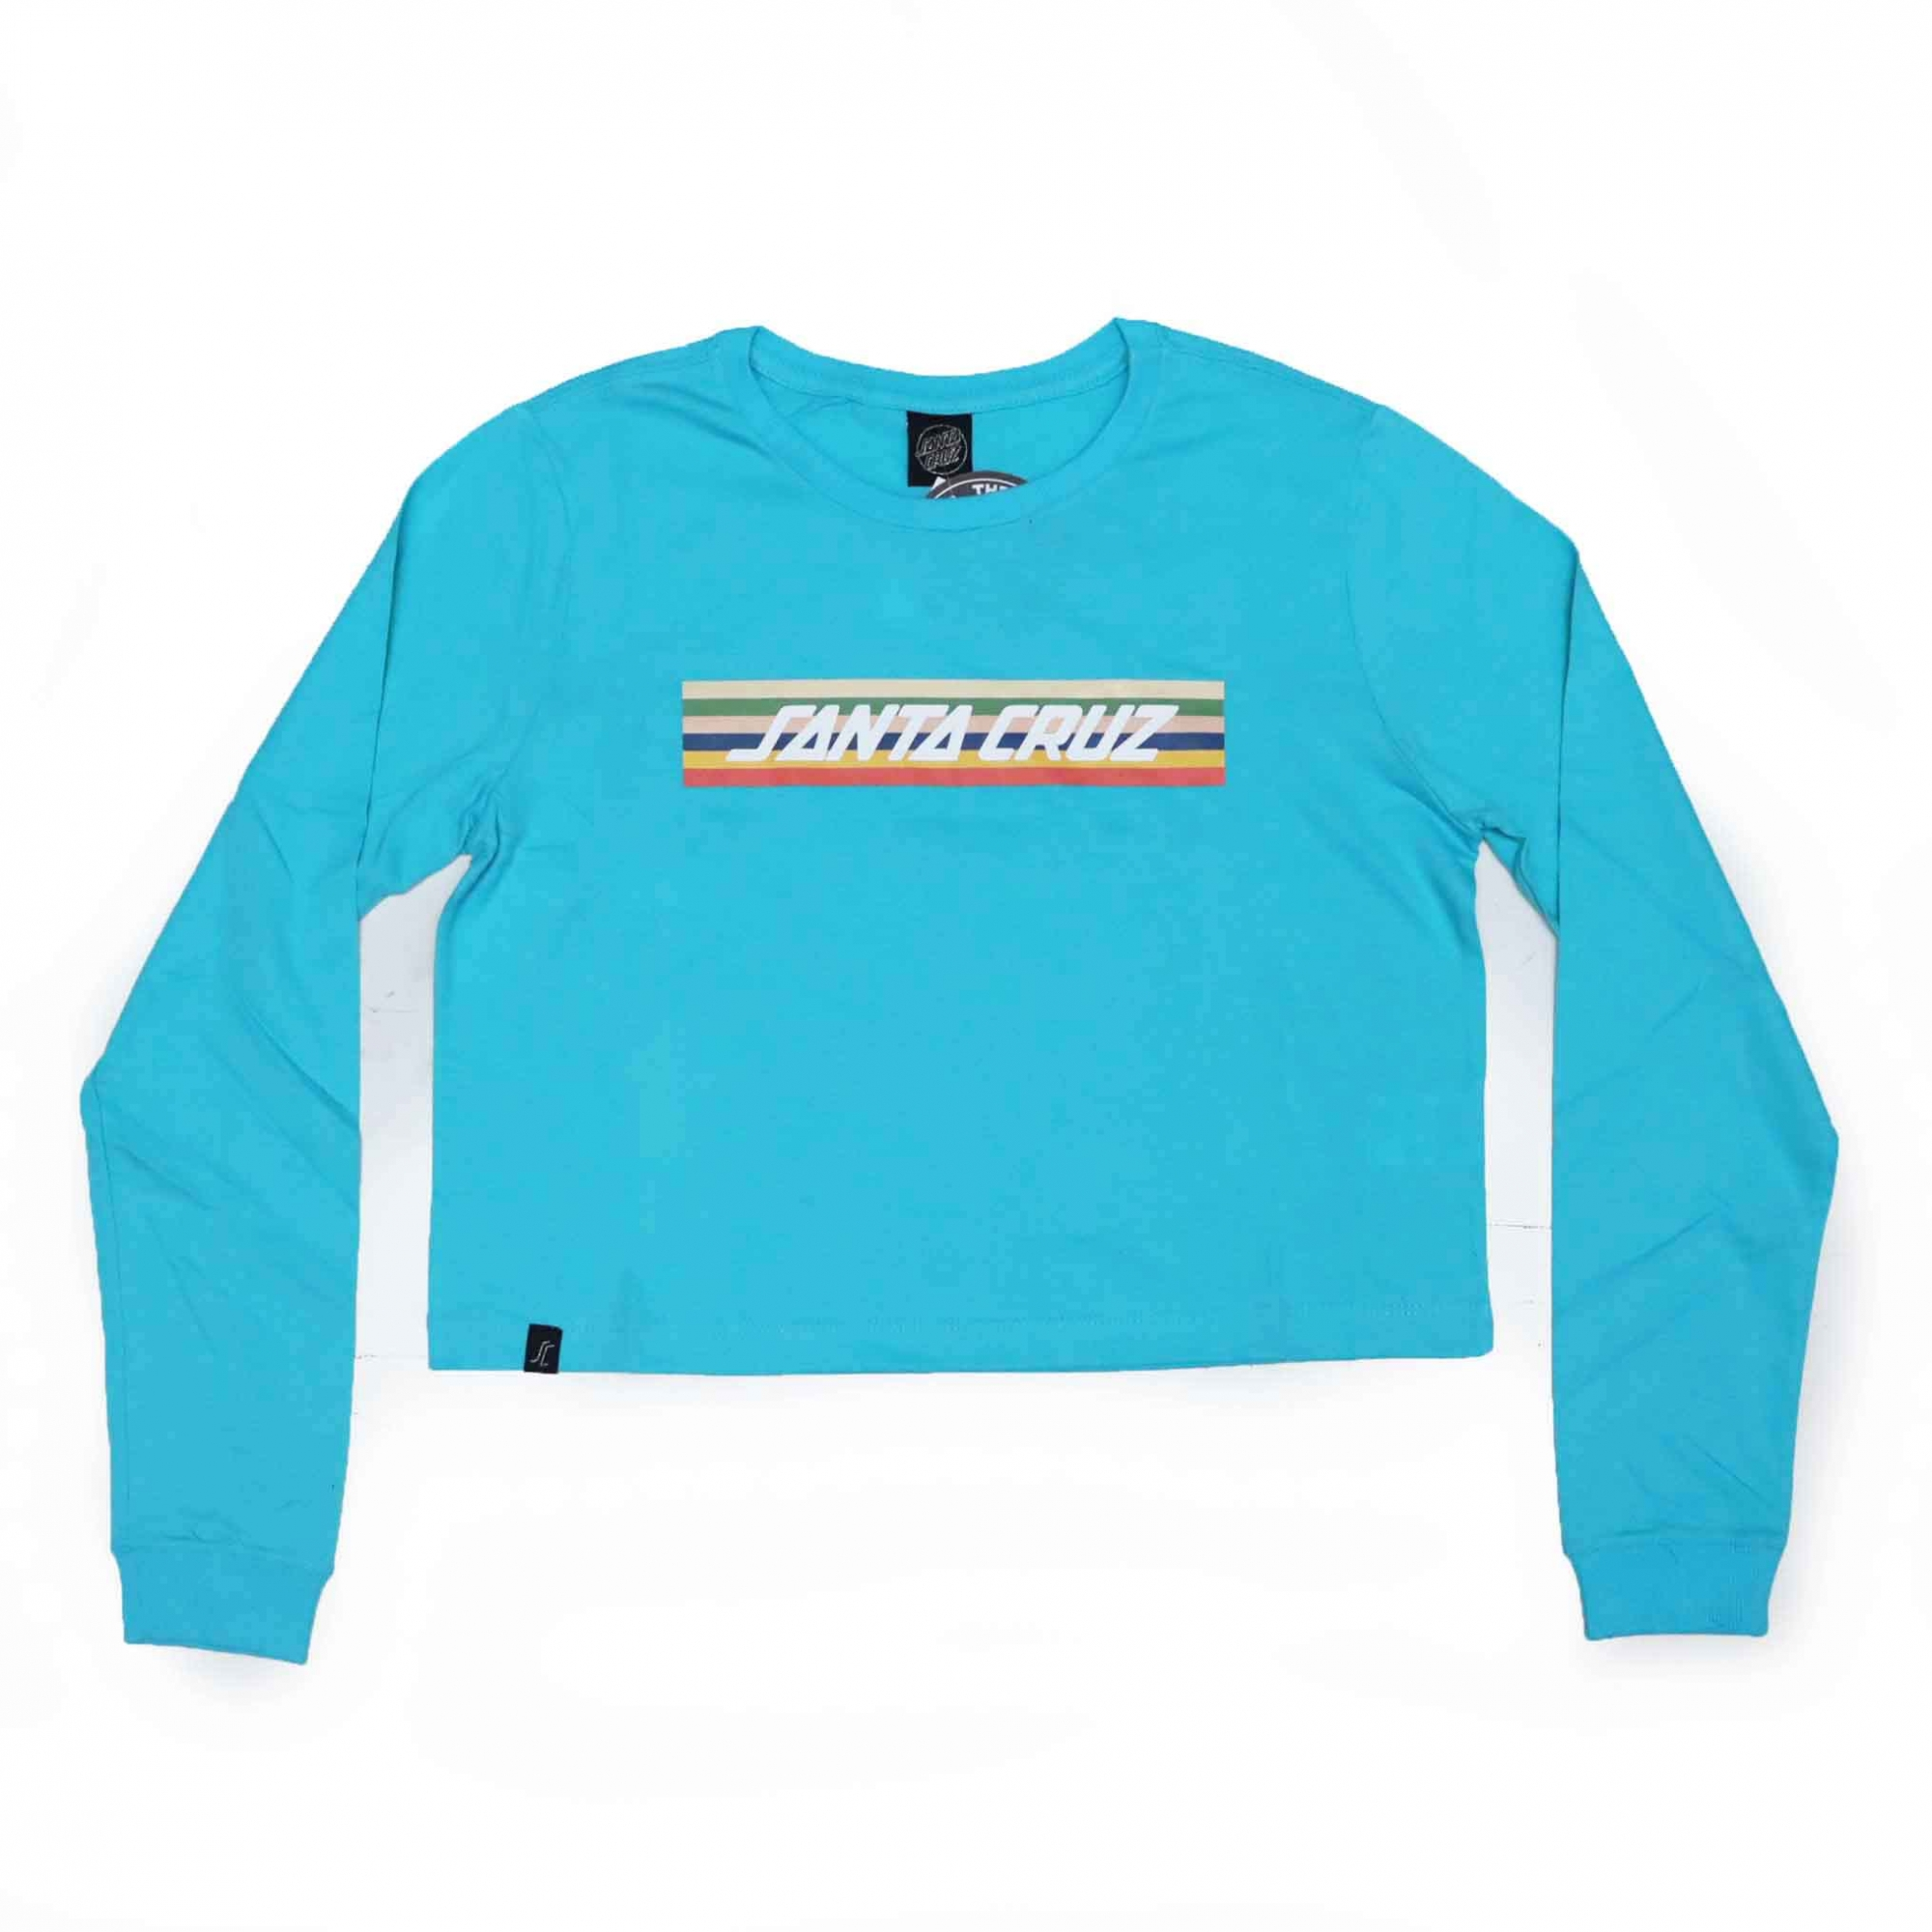 Camiseta Manga Longa Cropp Feminina Santa Cruz Stripe - Azul Turquesa